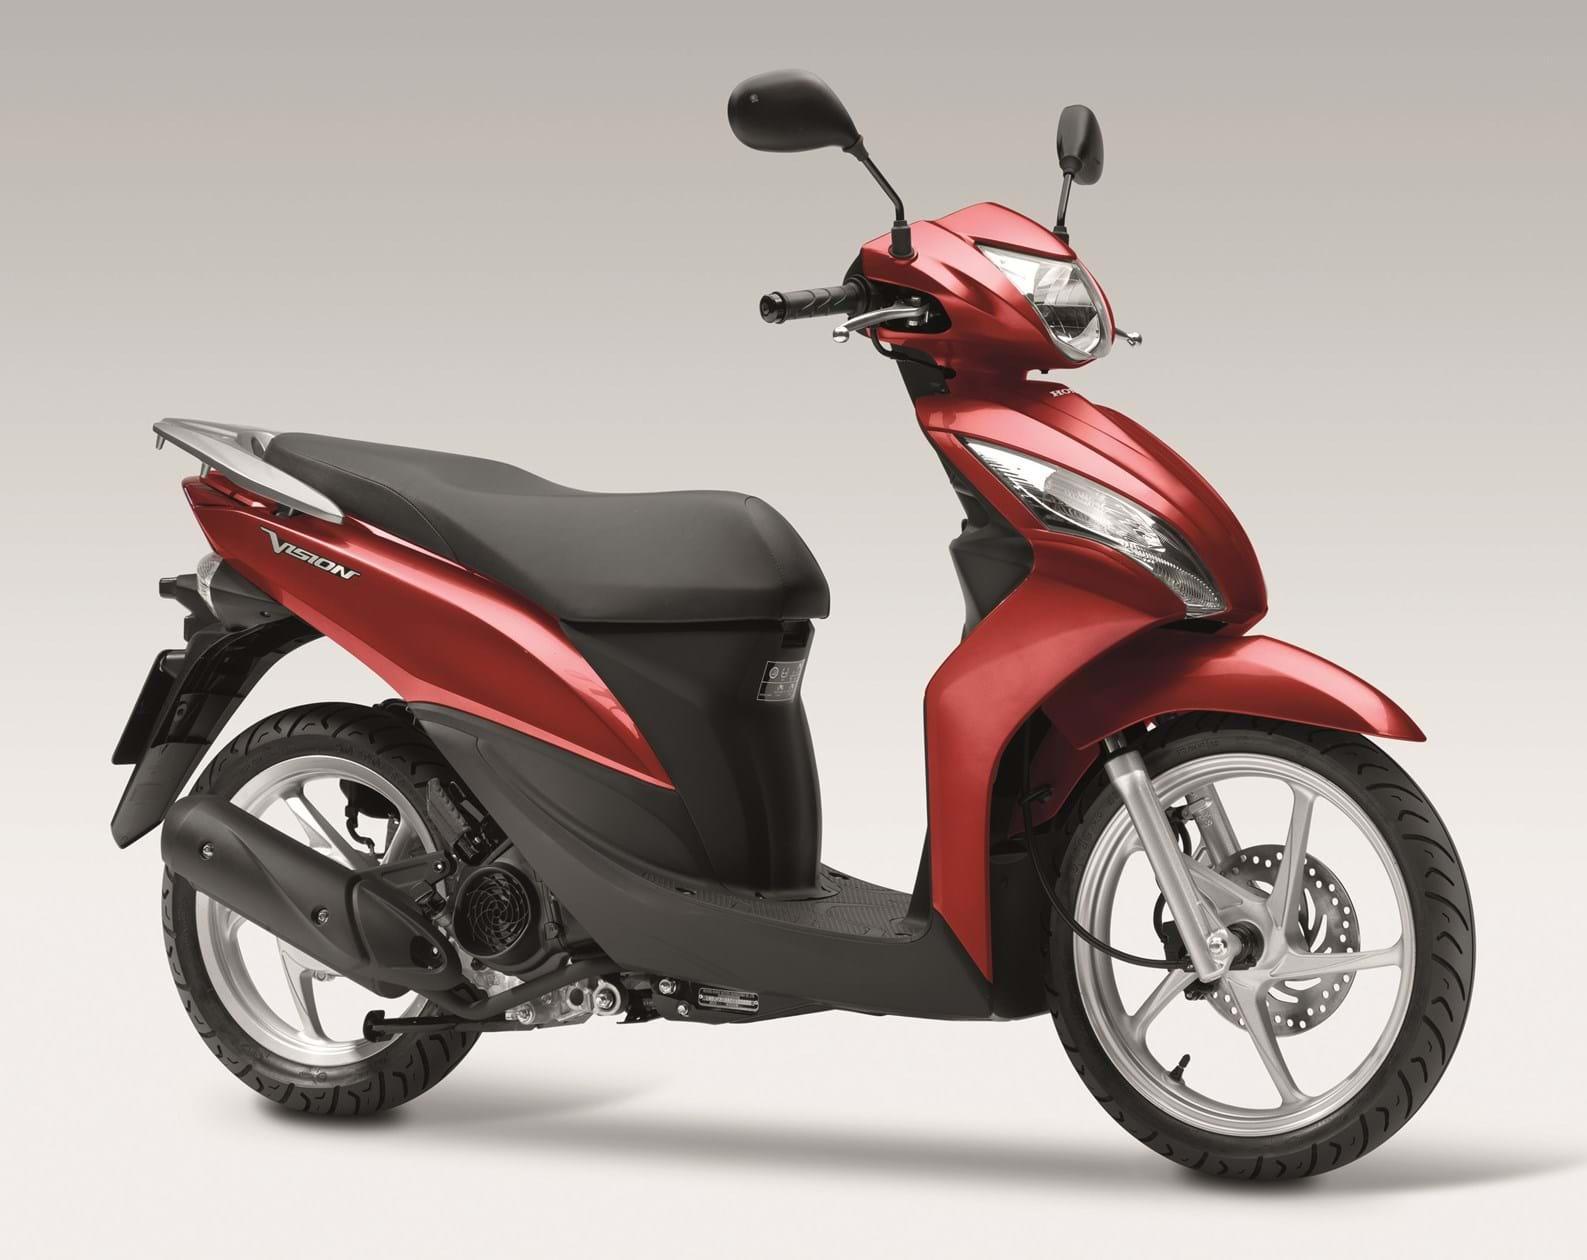 For Sale: Honda Vision 110 • The Bike Market